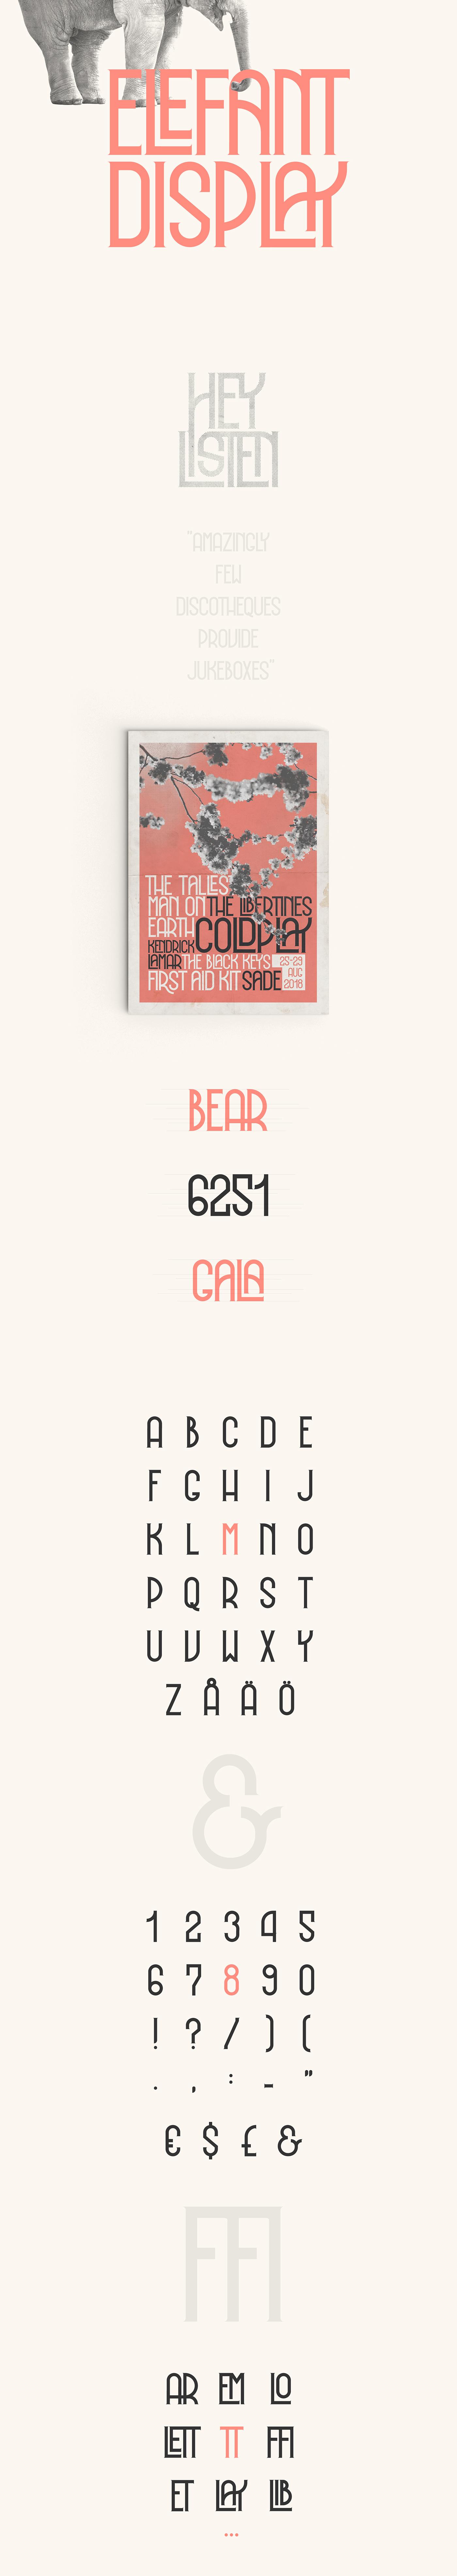 font type vintage Retro poster elegant geometric ligature band music